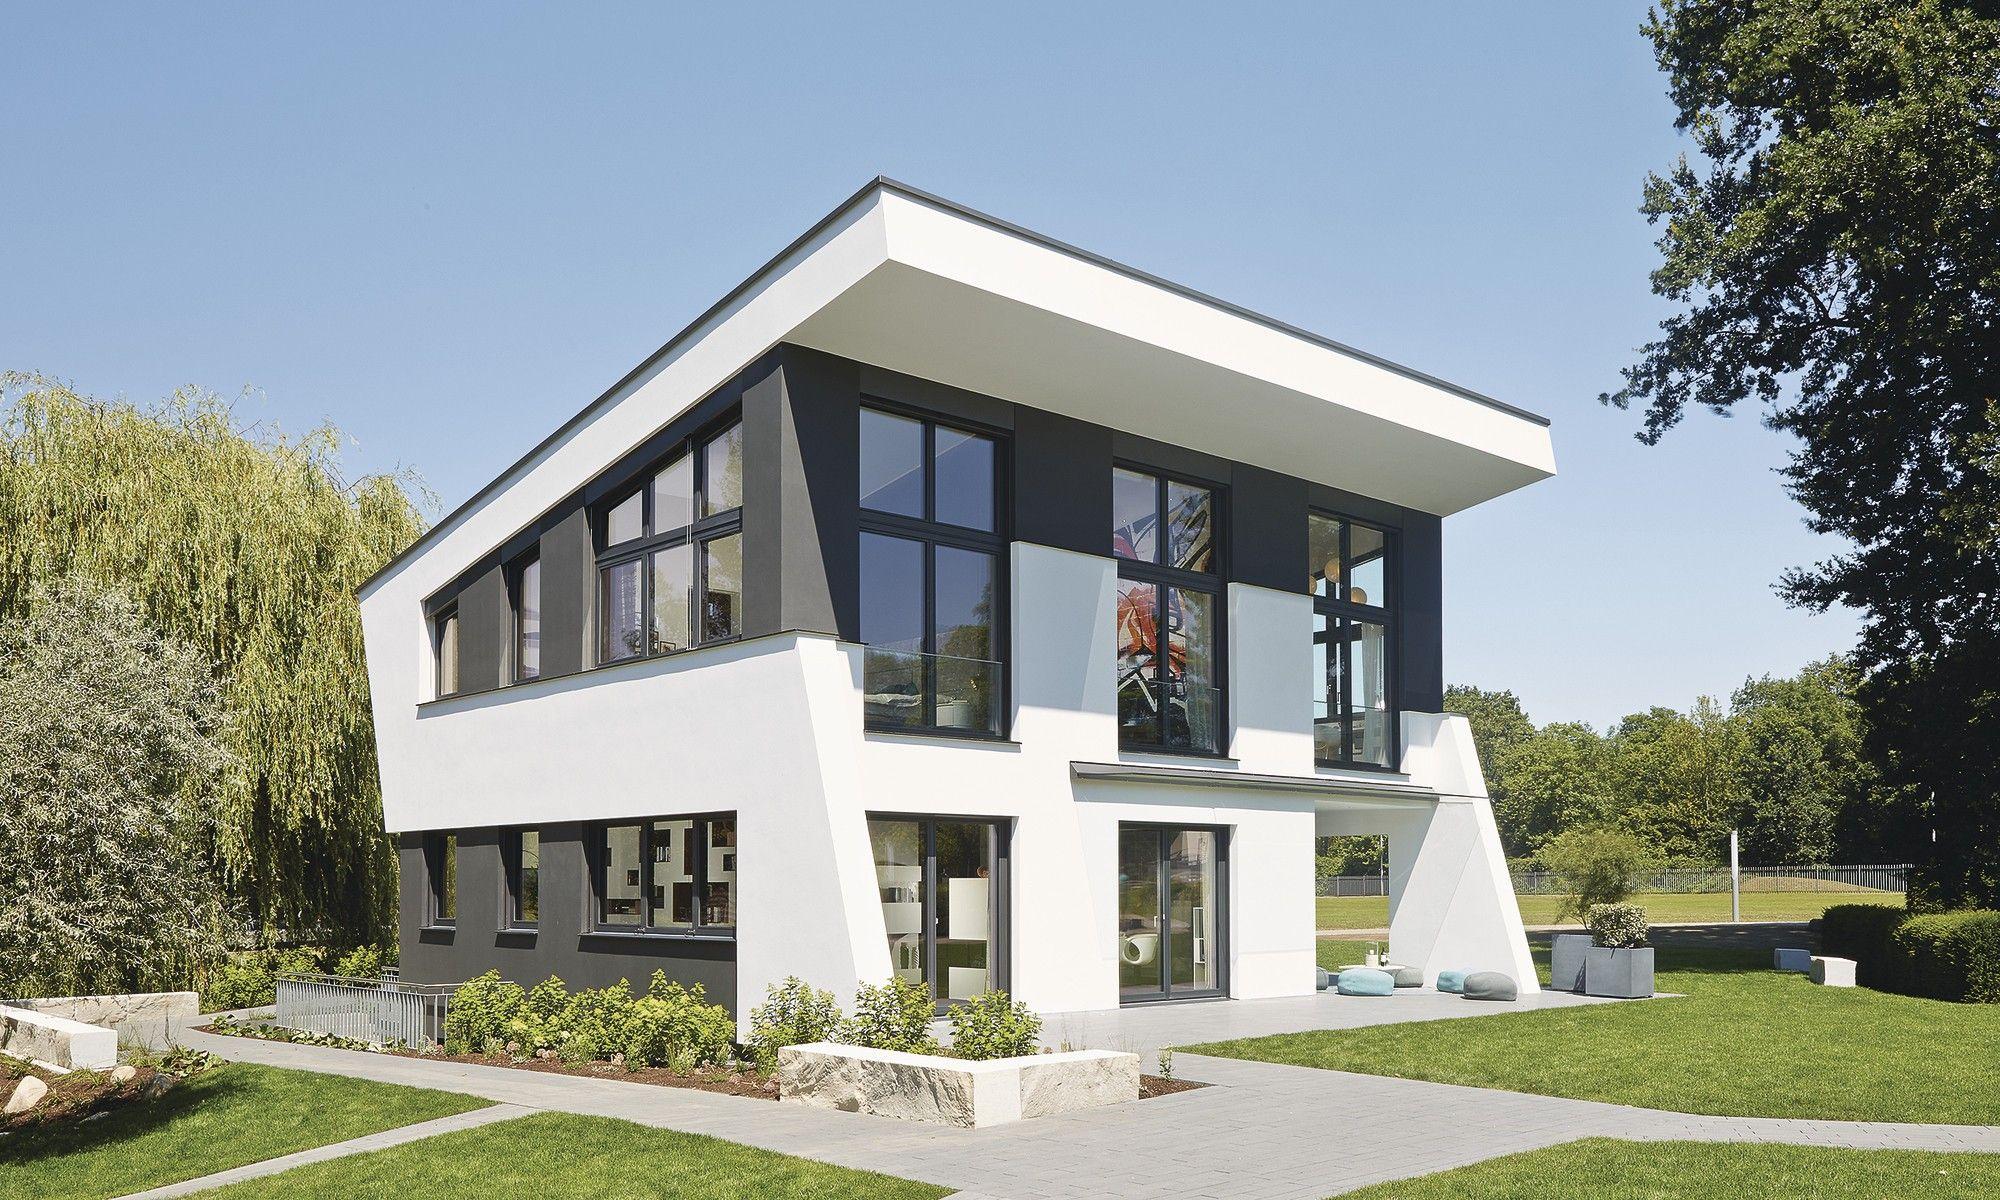 Ultra modern urban loft style prefab house with underfloor heating